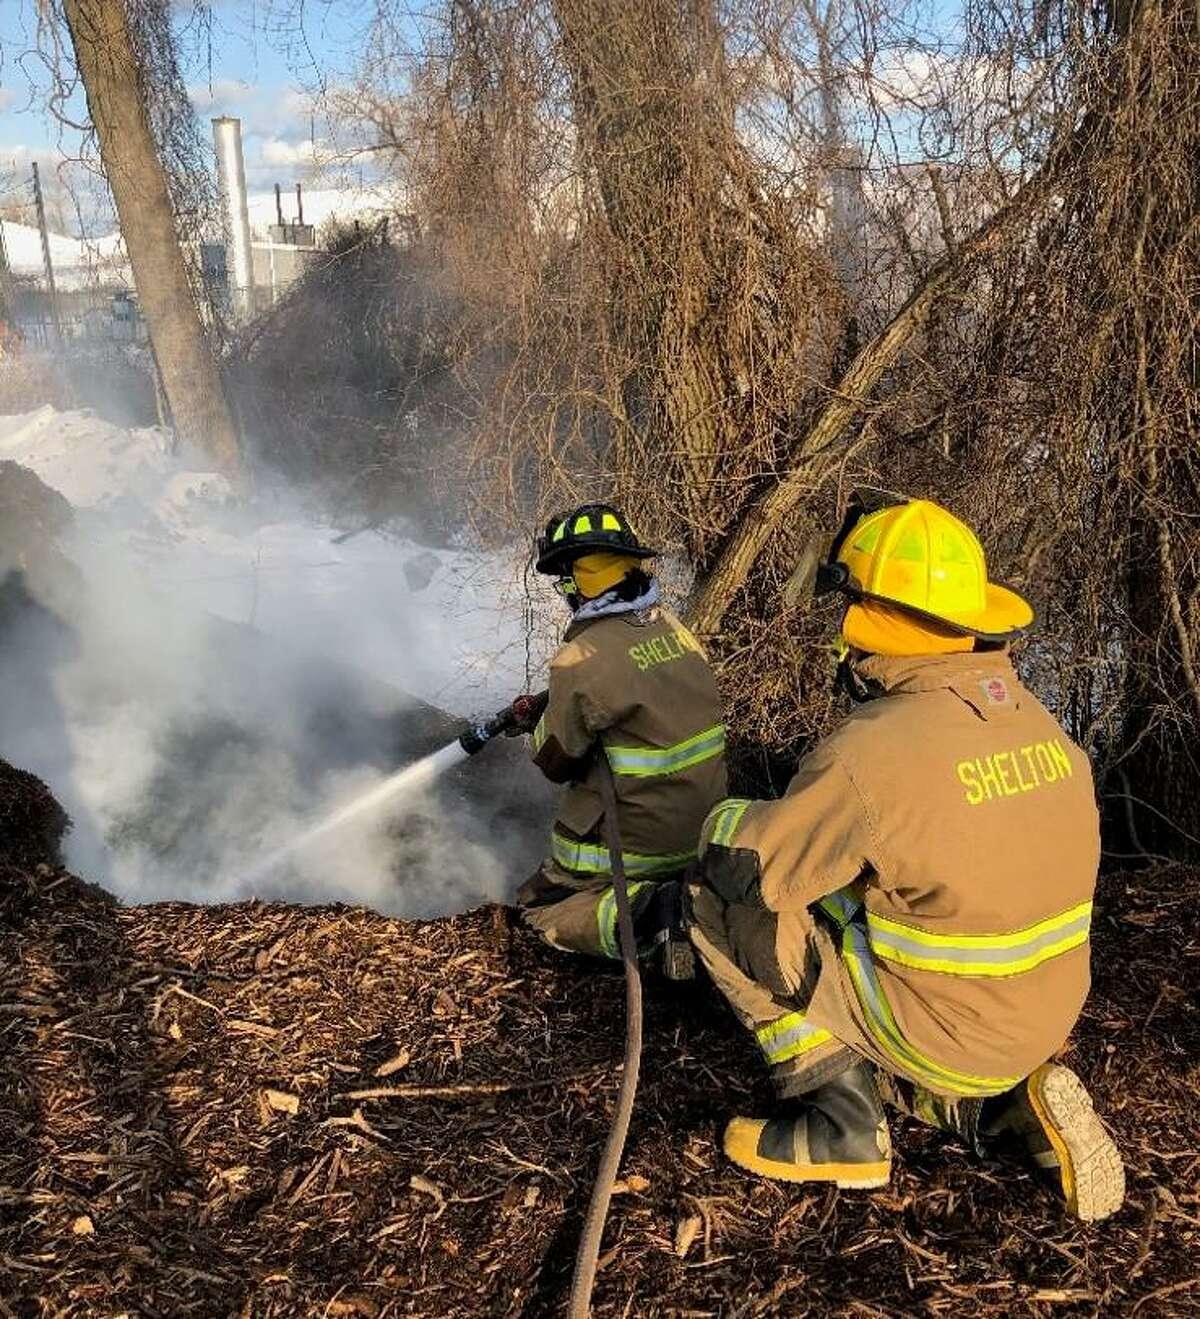 Shelton firefighters battle a mulch fire at the city transfer station Sunday, Feb. 21.